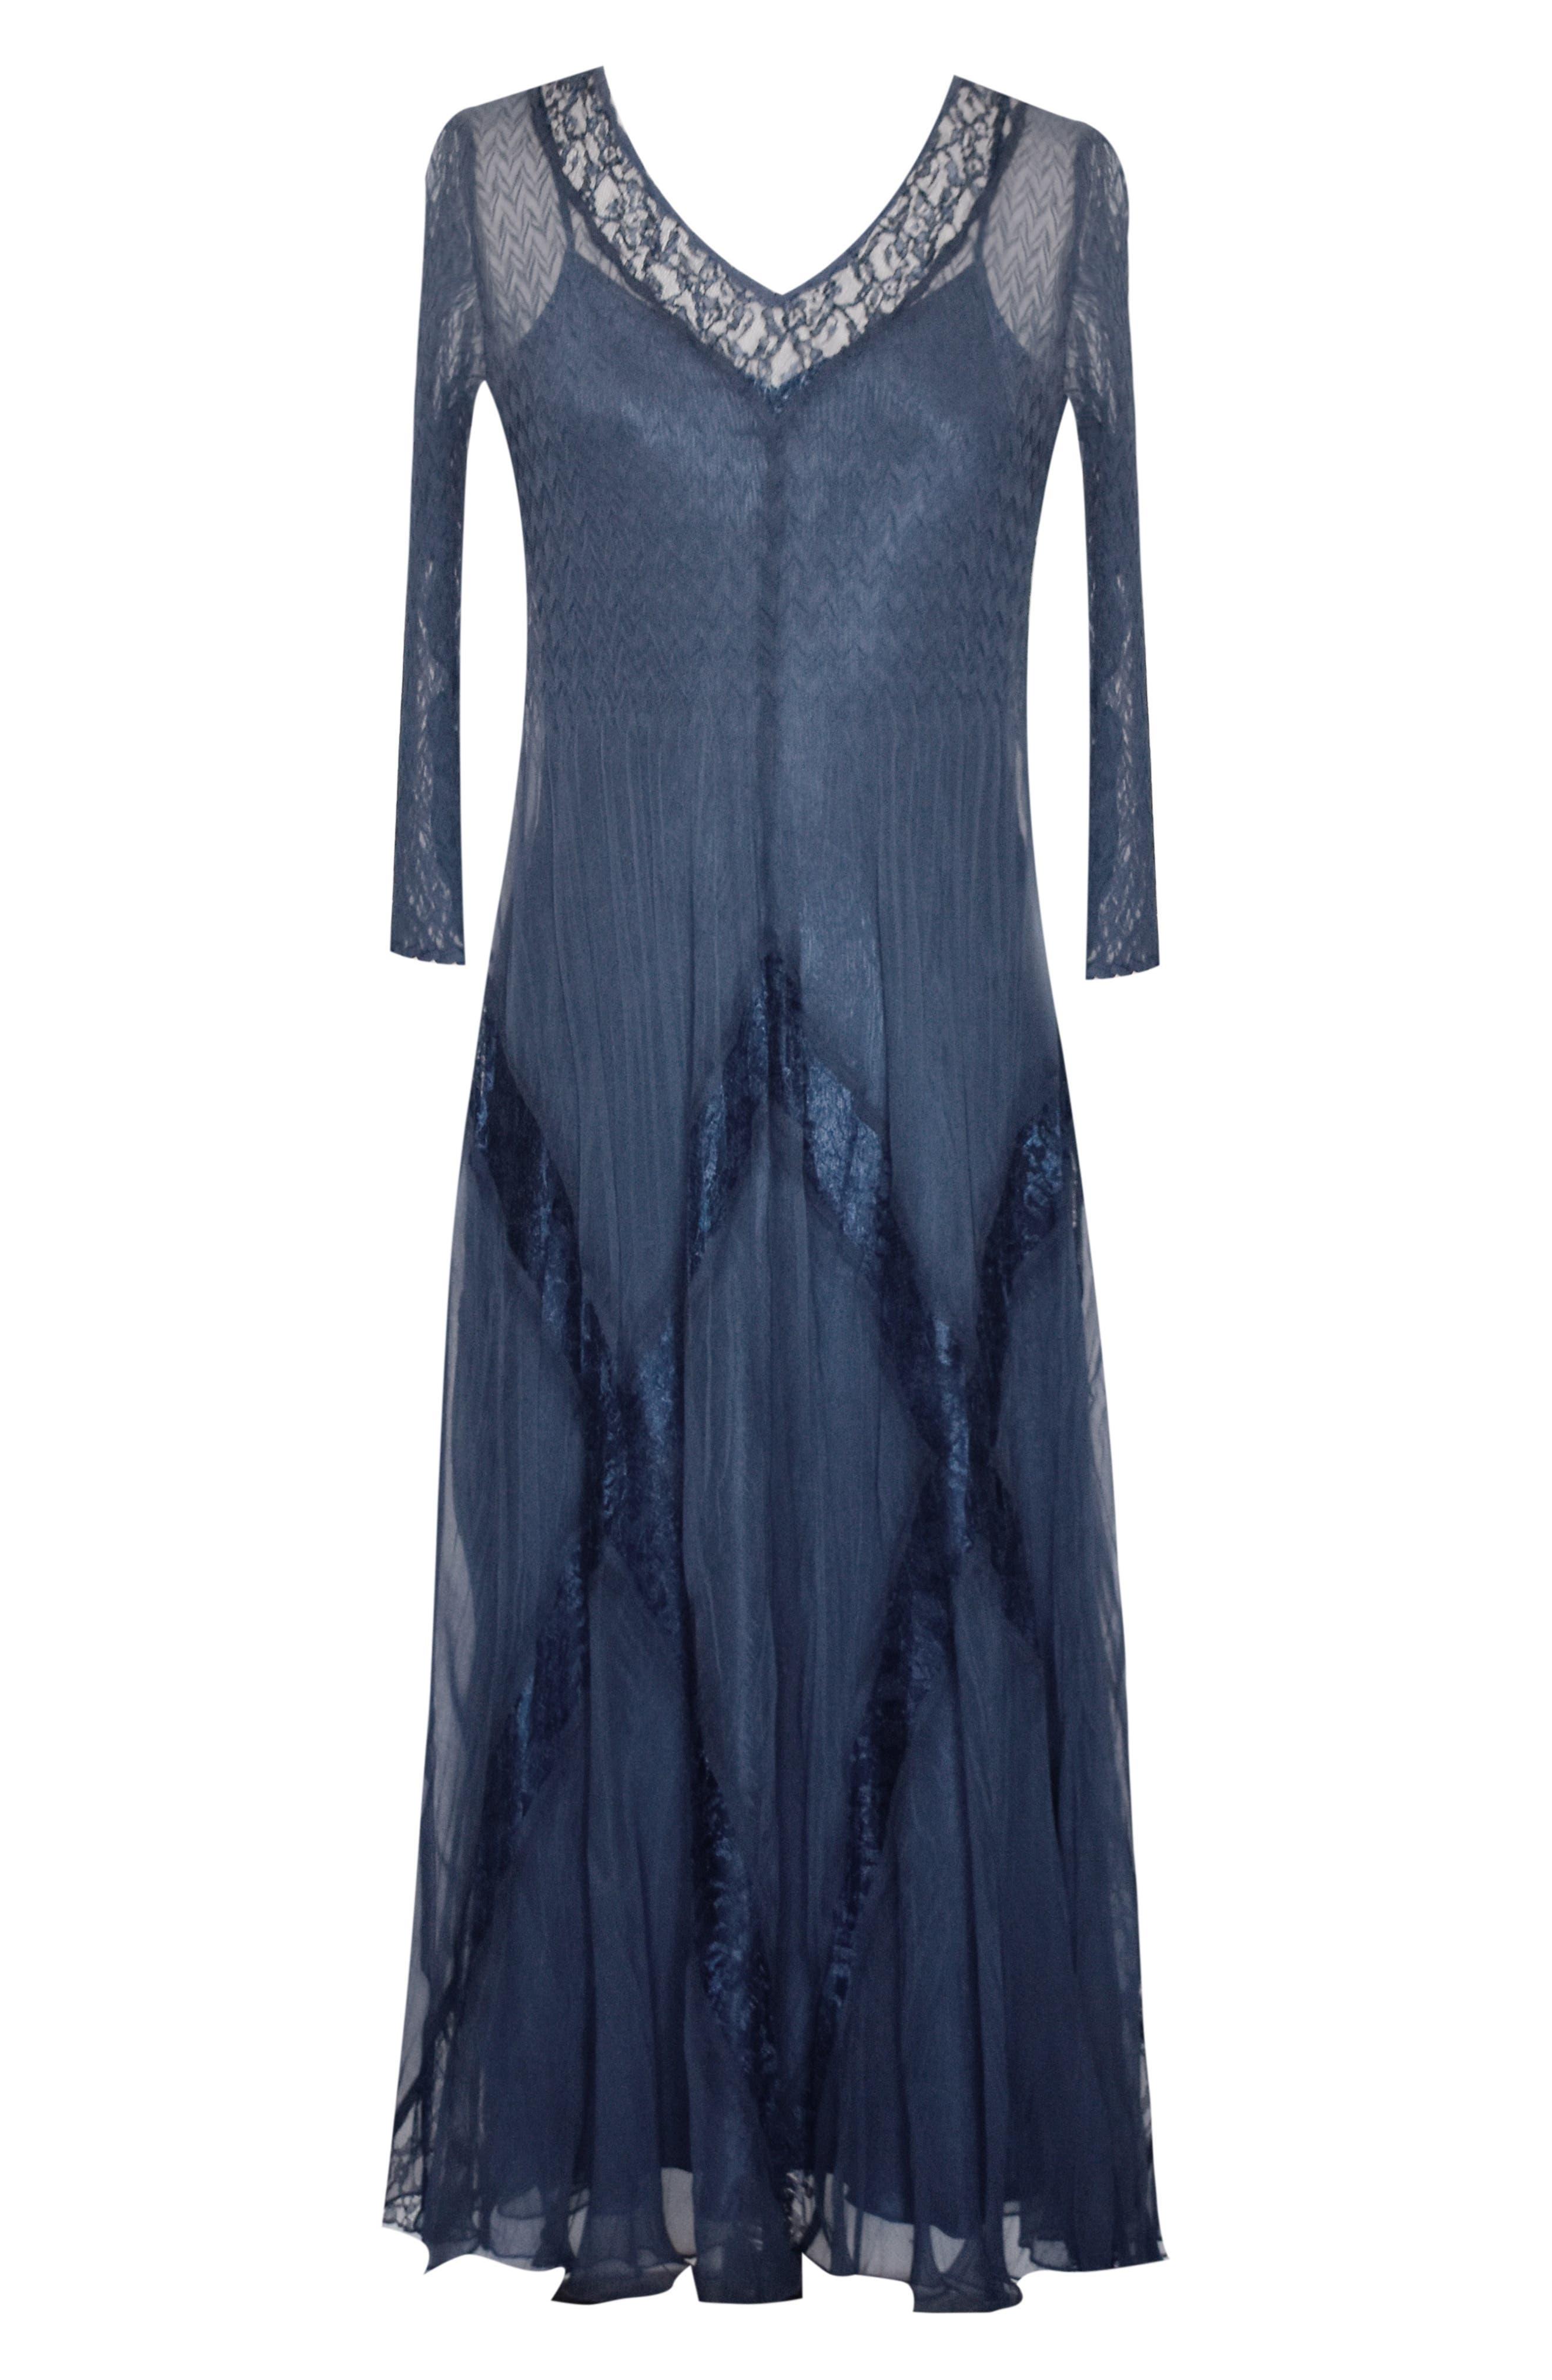 KOMAROV, Beaded Chiffon A-Line Dress, Alternate thumbnail 5, color, 400